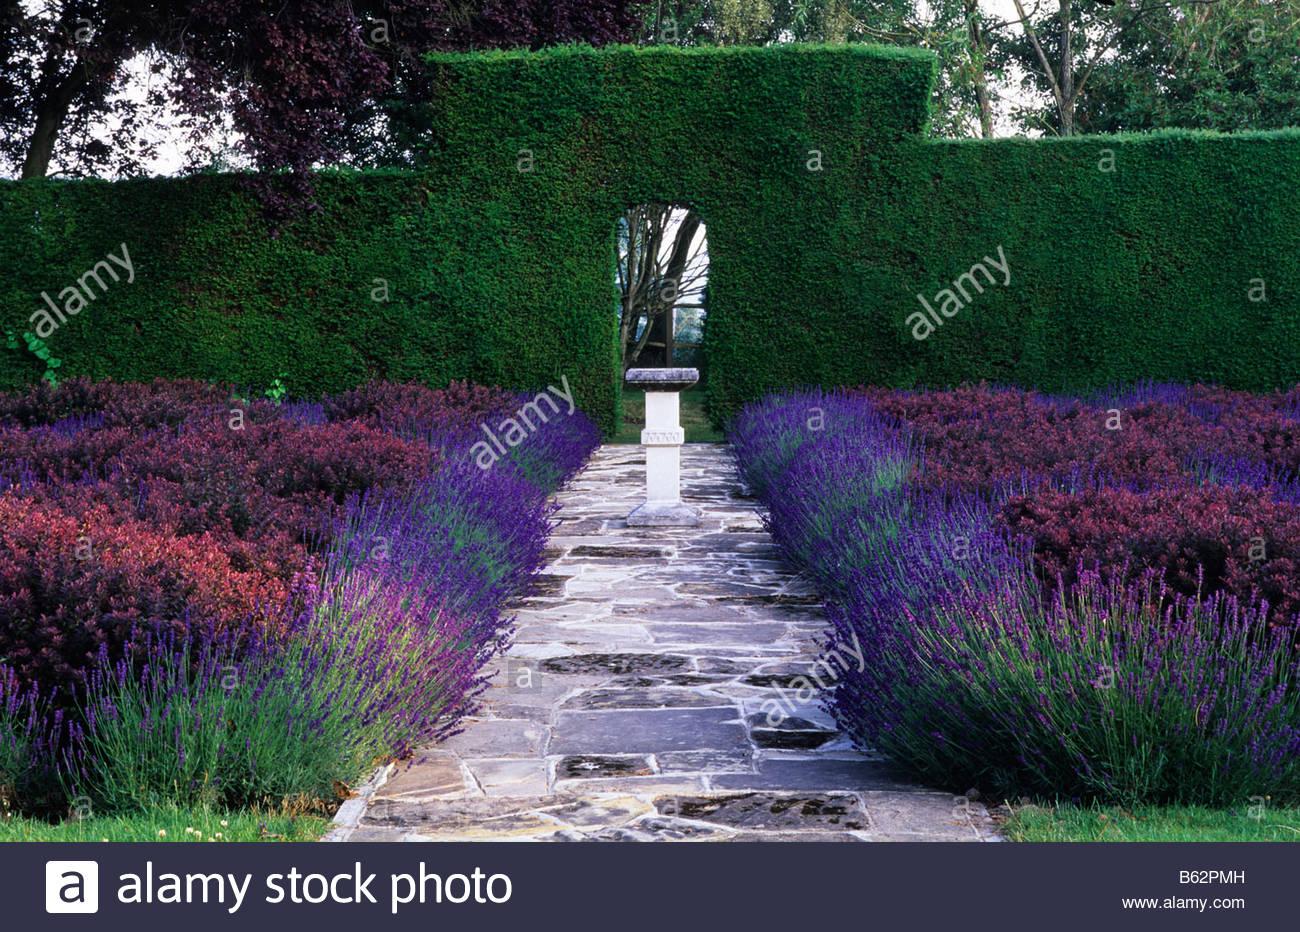 knot garden lavandula hidcote berberis thunbergii atropurpurea nana stock photo 20960033 alamy. Black Bedroom Furniture Sets. Home Design Ideas